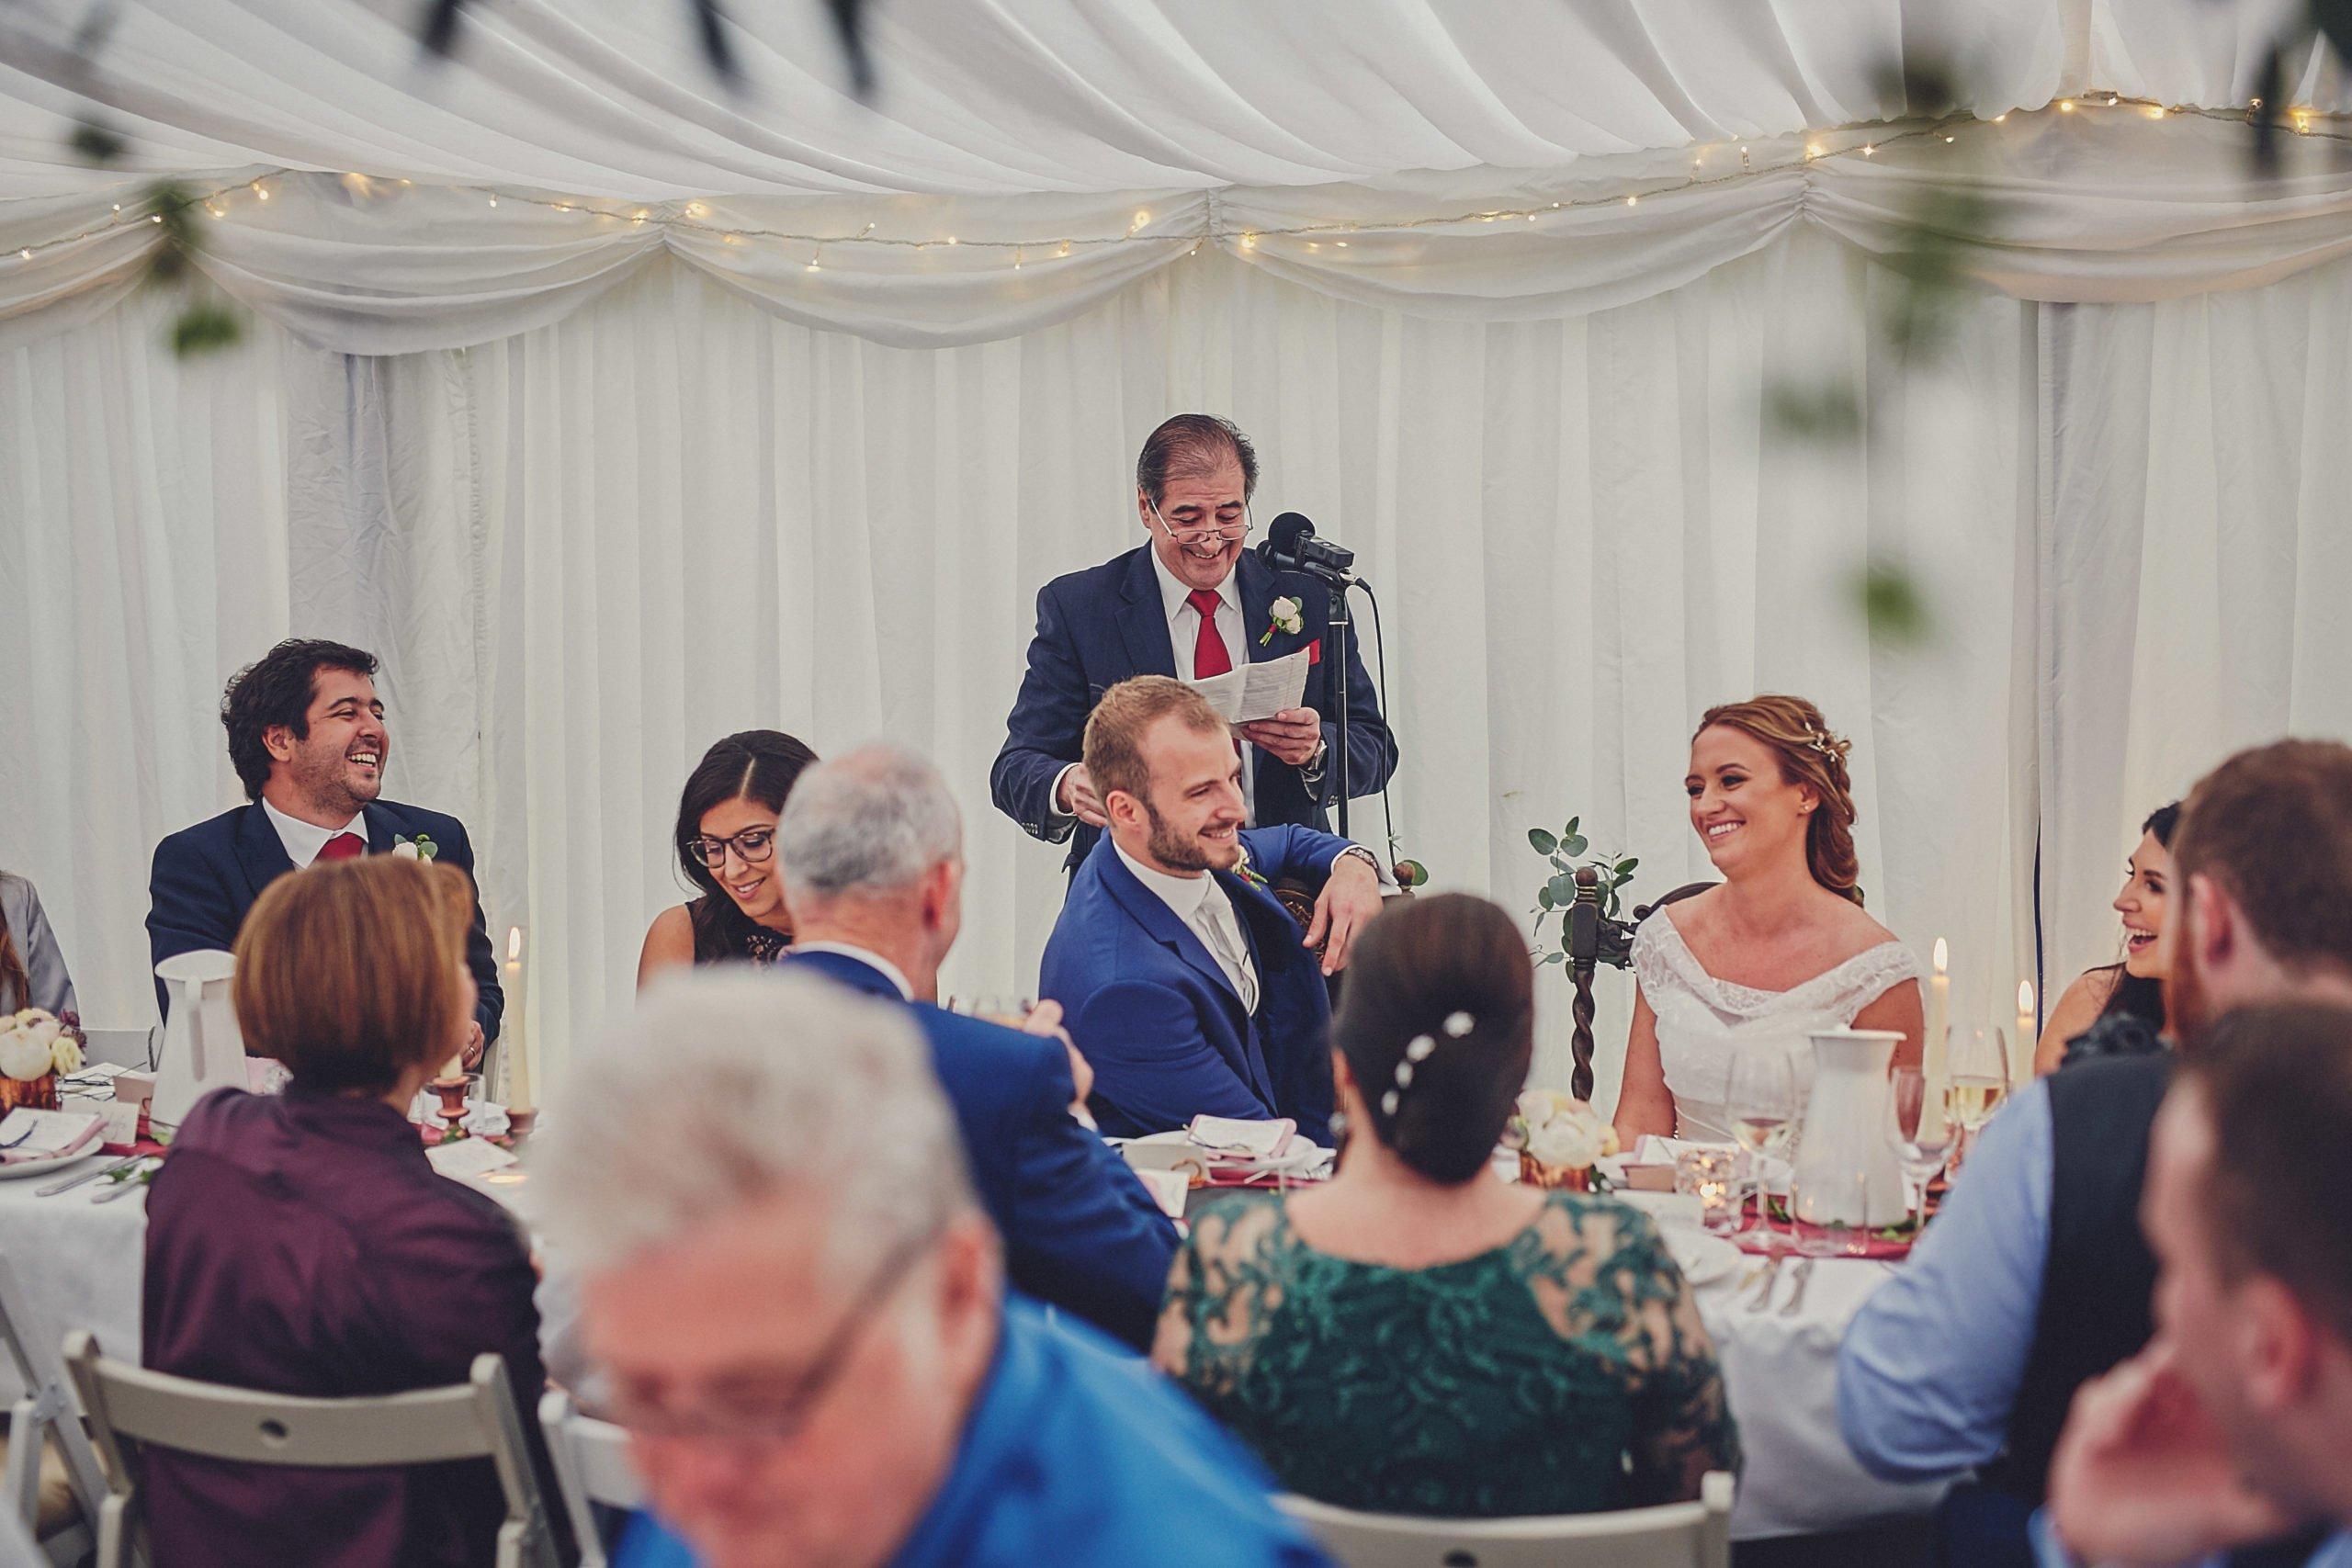 Cloughjordan House Wedding - Alternative Venue 128